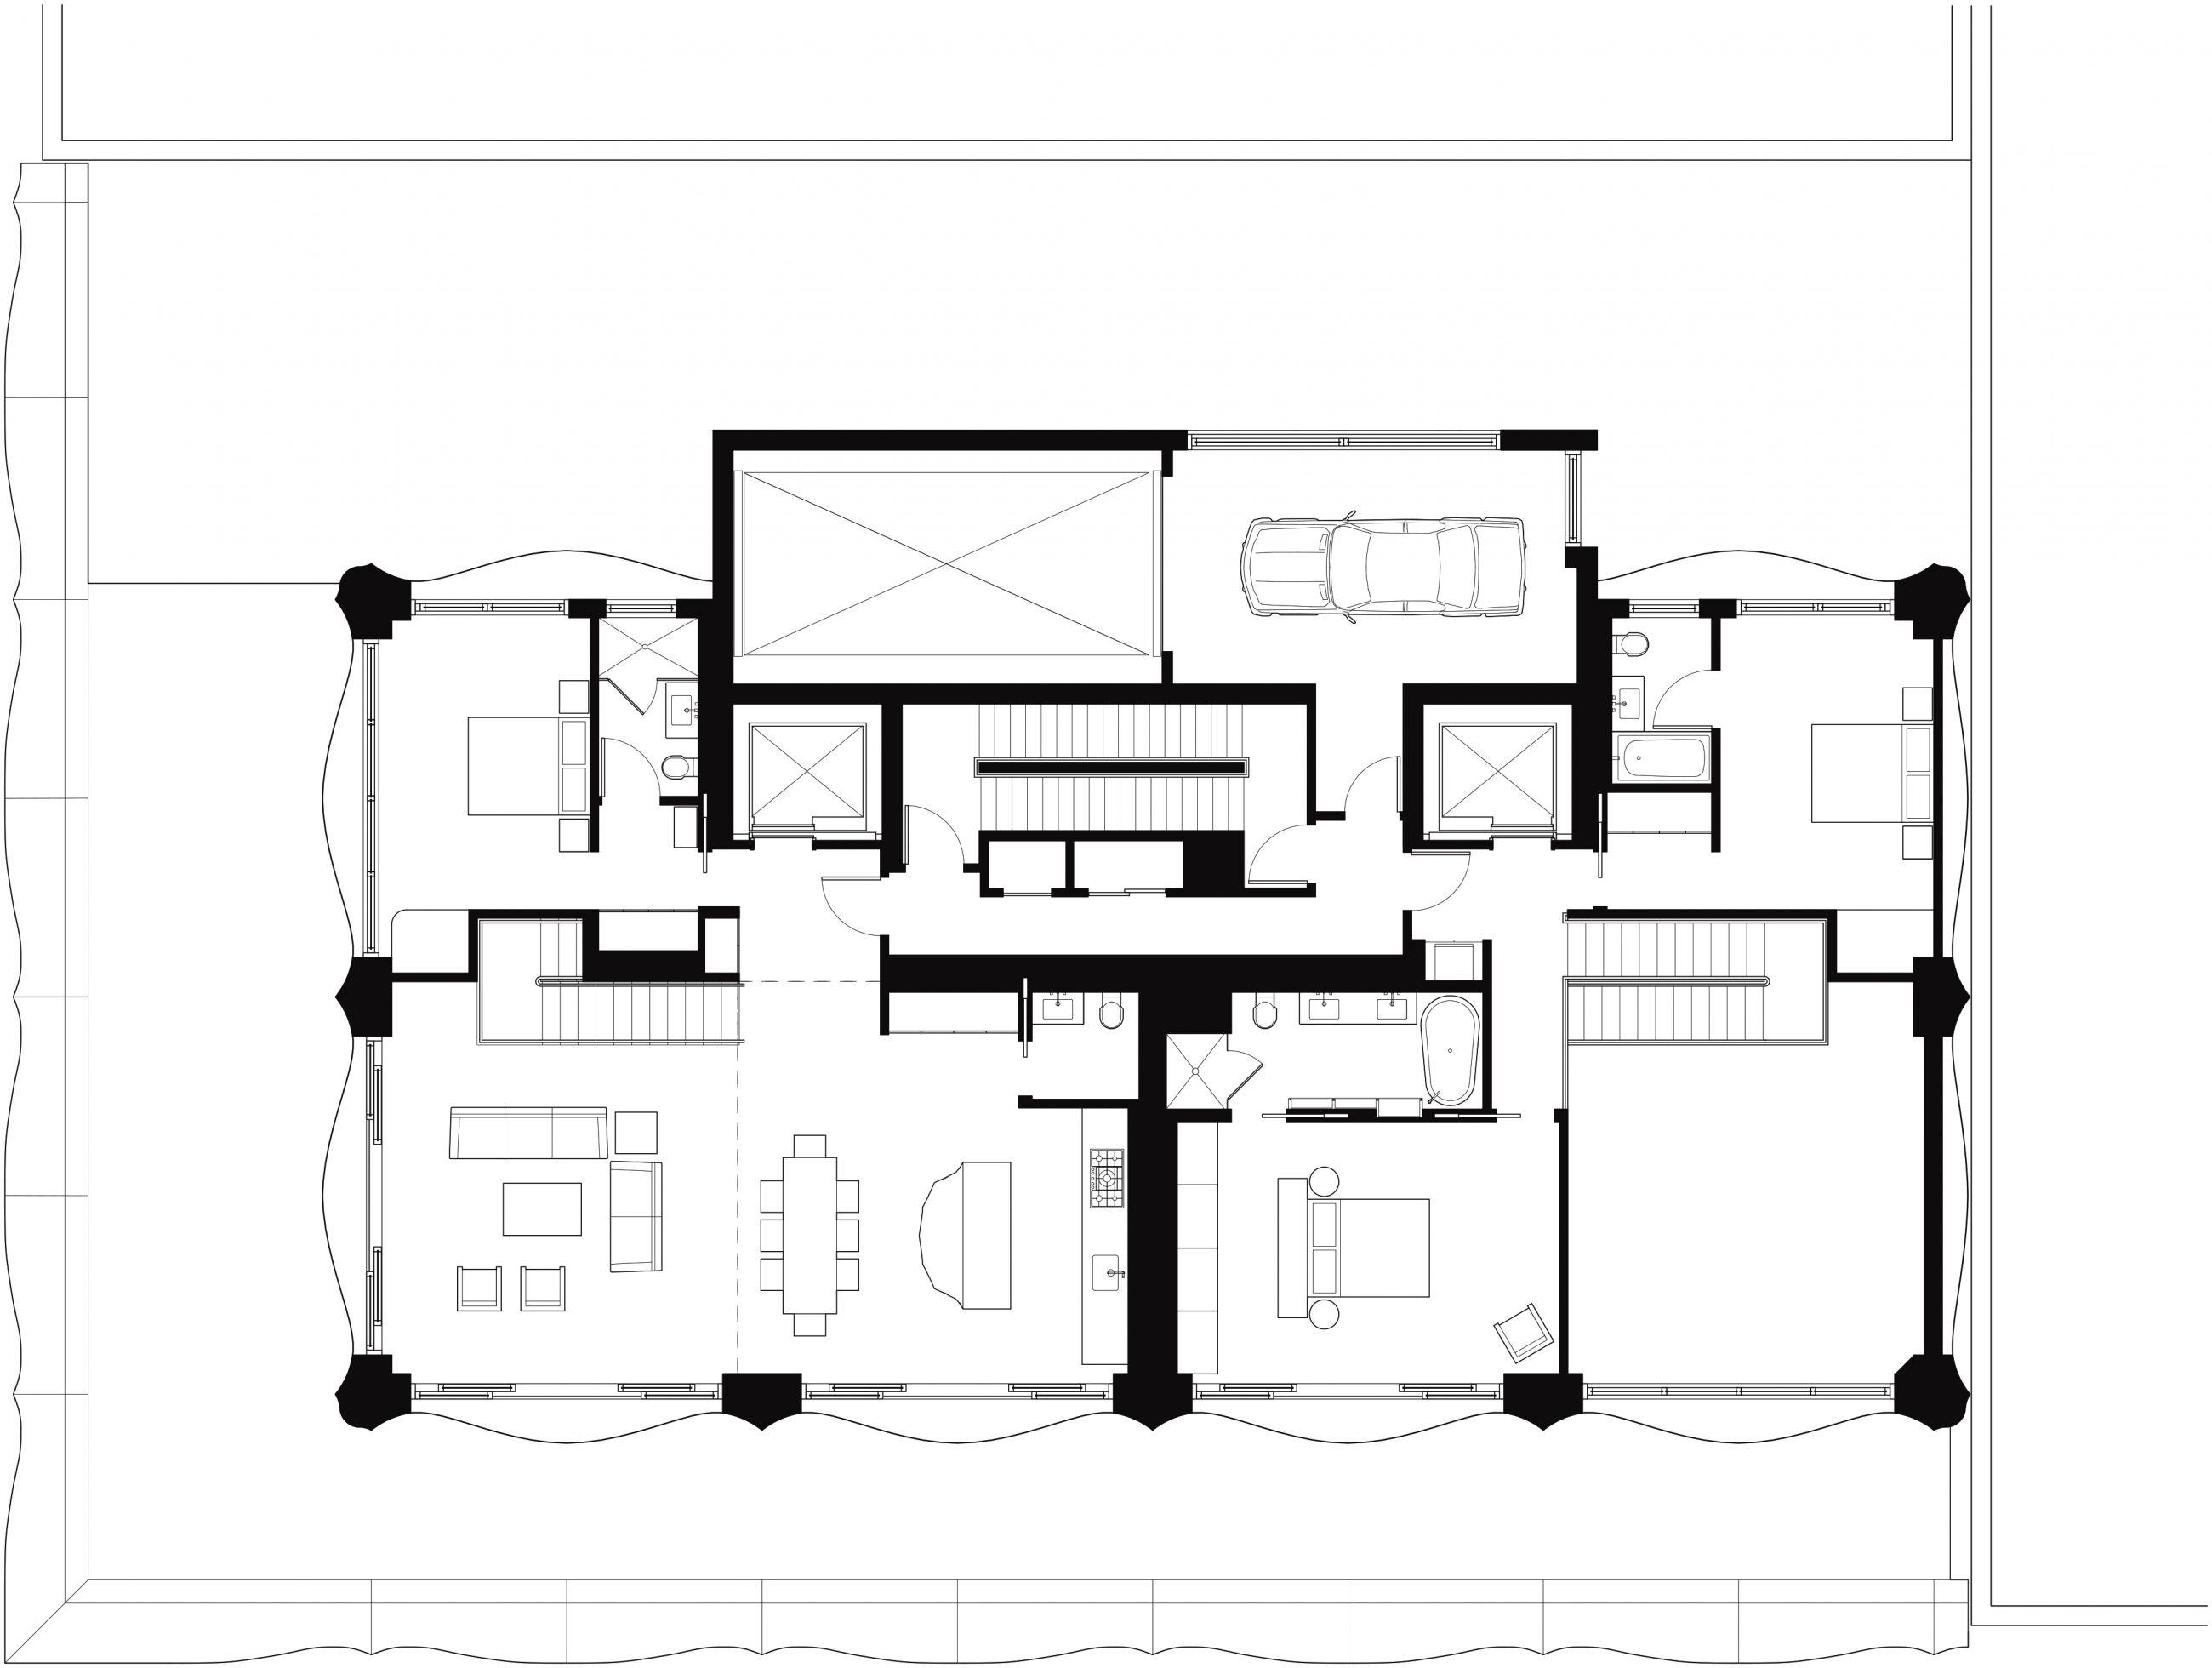 200 Eleventh Avenue 10th Floor Plan